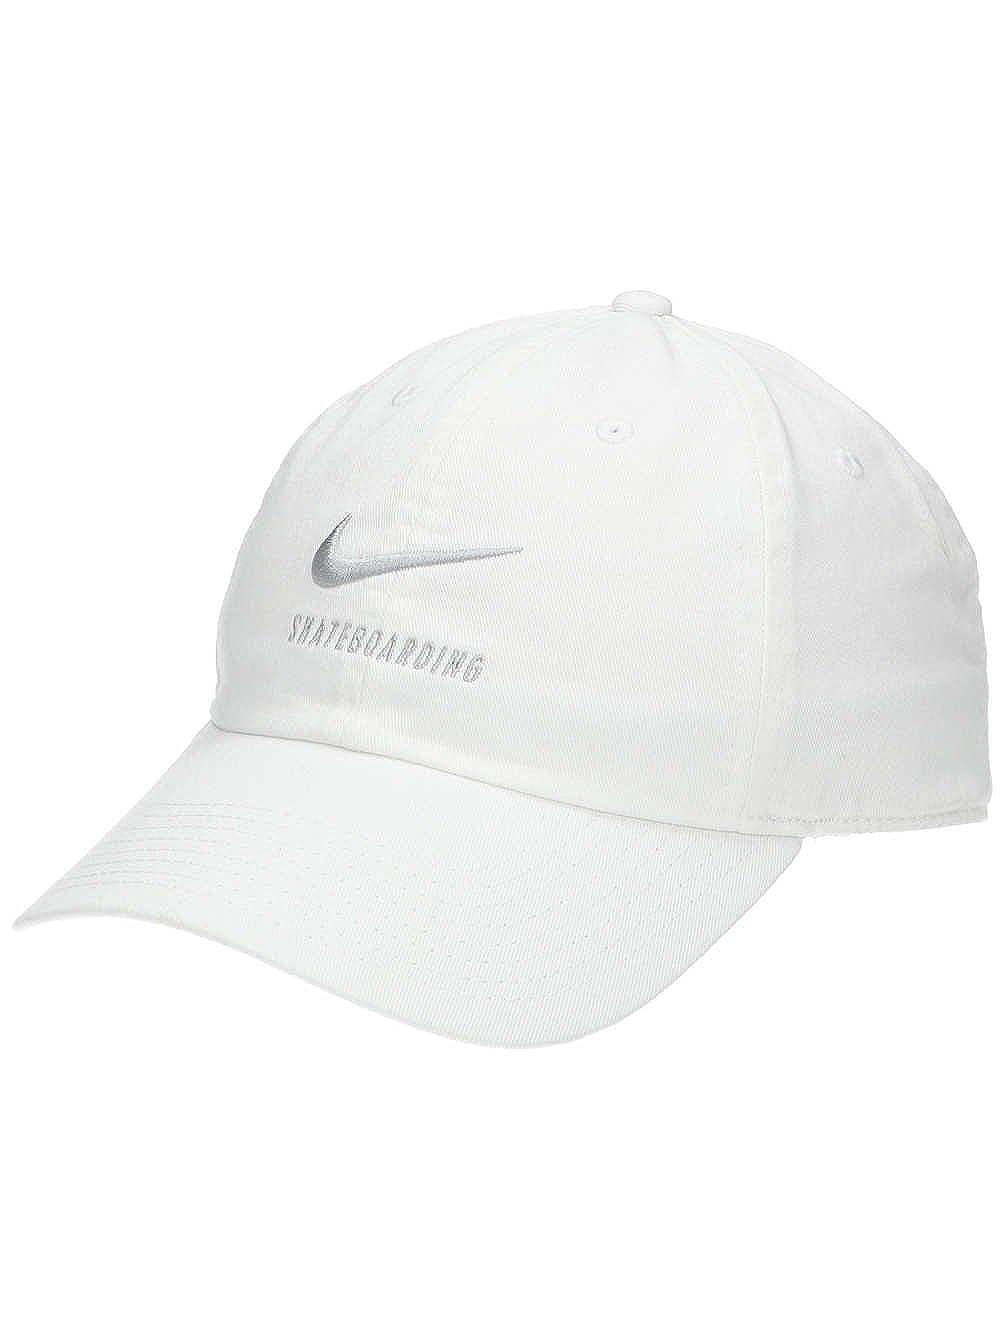 9db7710a180 Amazon.com  Nike H86 SB Skateboarding Adjustable Hat Black White  828635-010  Sports   Outdoors